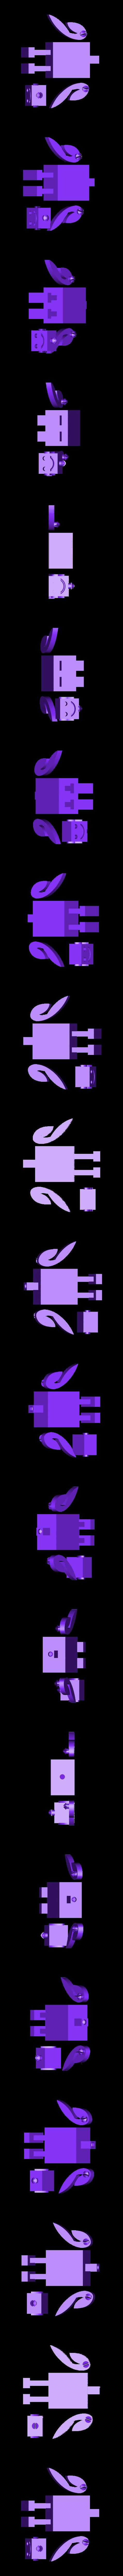 Robot articulé.stl Download free STL file Robotic mascot robot V2 • 3D printer template, EdeziV